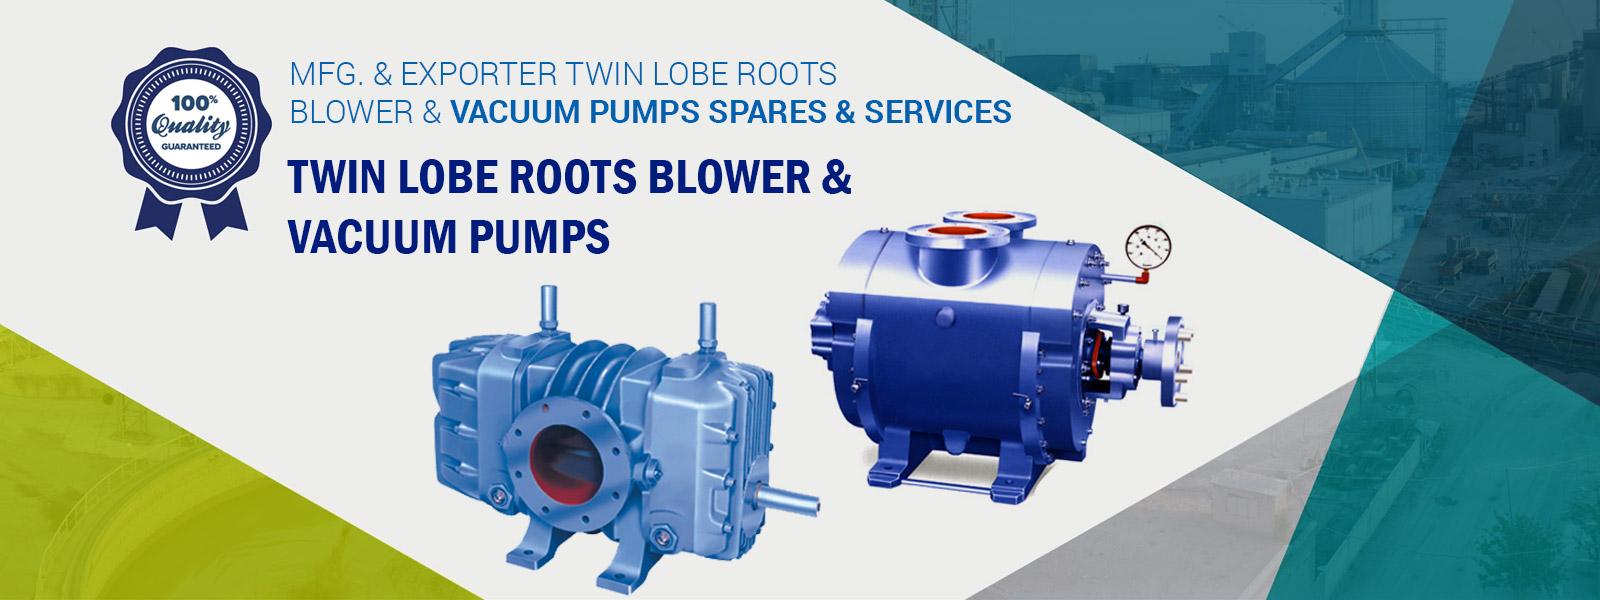 Twin Lobe Roots Blower Exporter